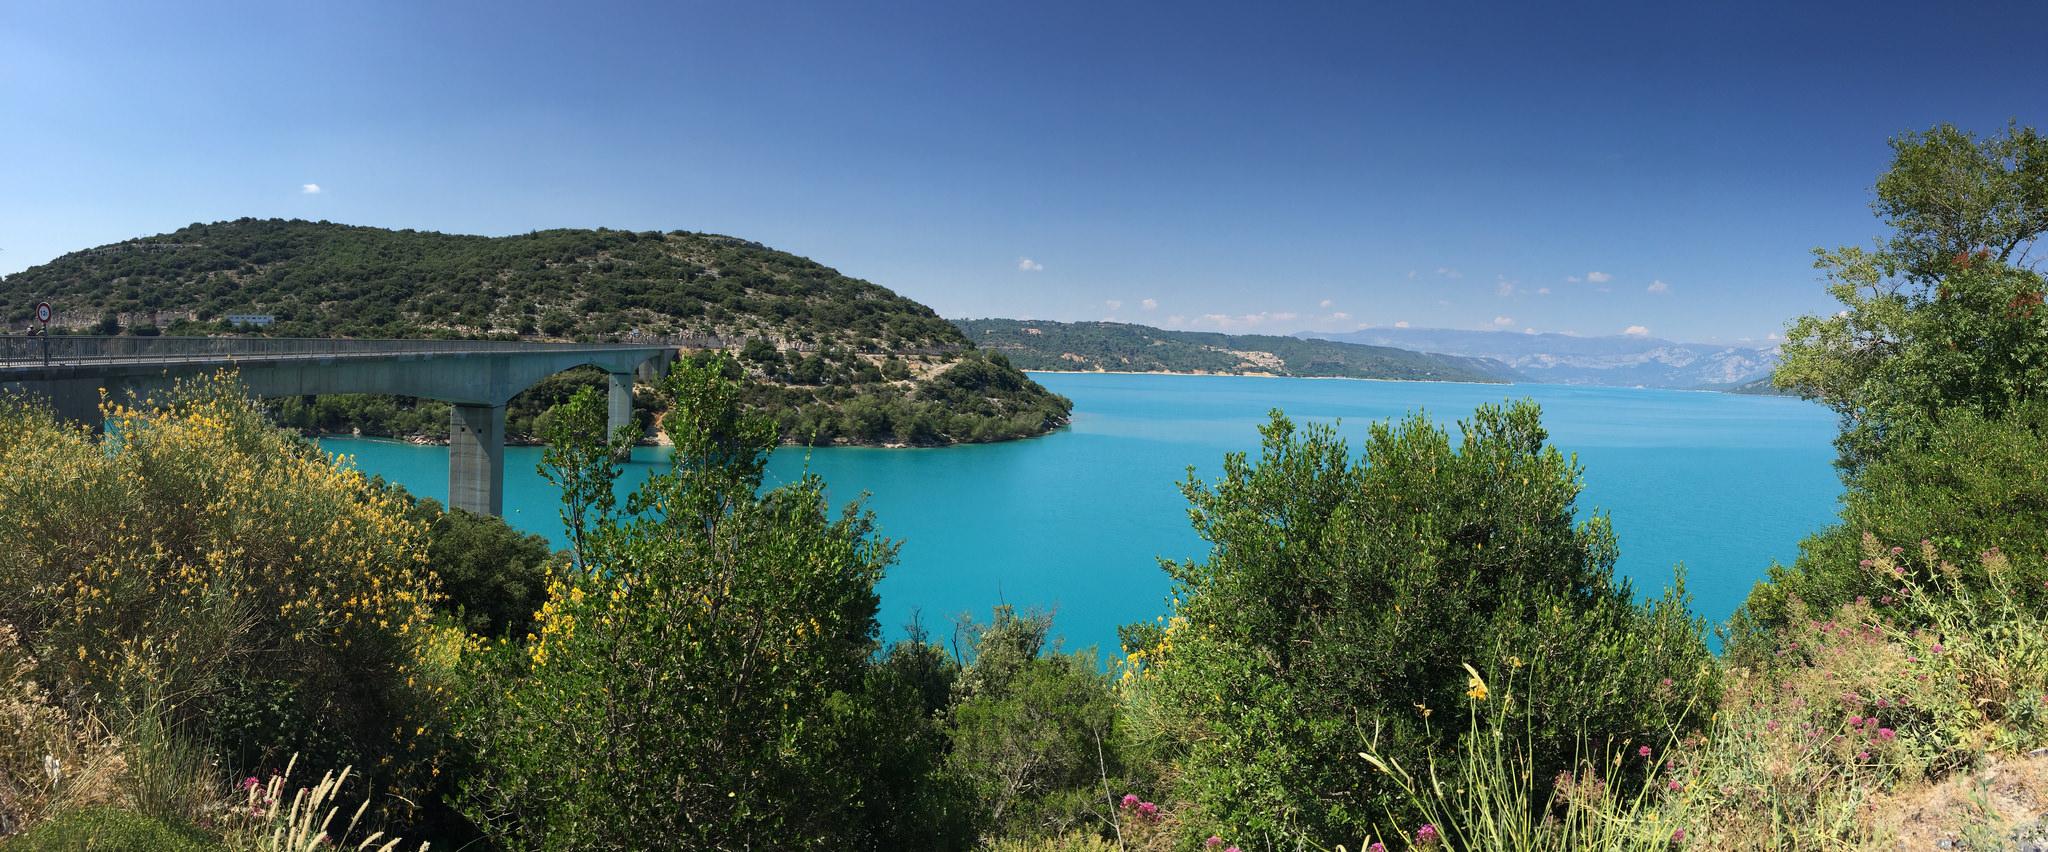 Glacial waters Gorges du Verdon EAT.PRAY.MOVE Yoga Retreats | Provence, France